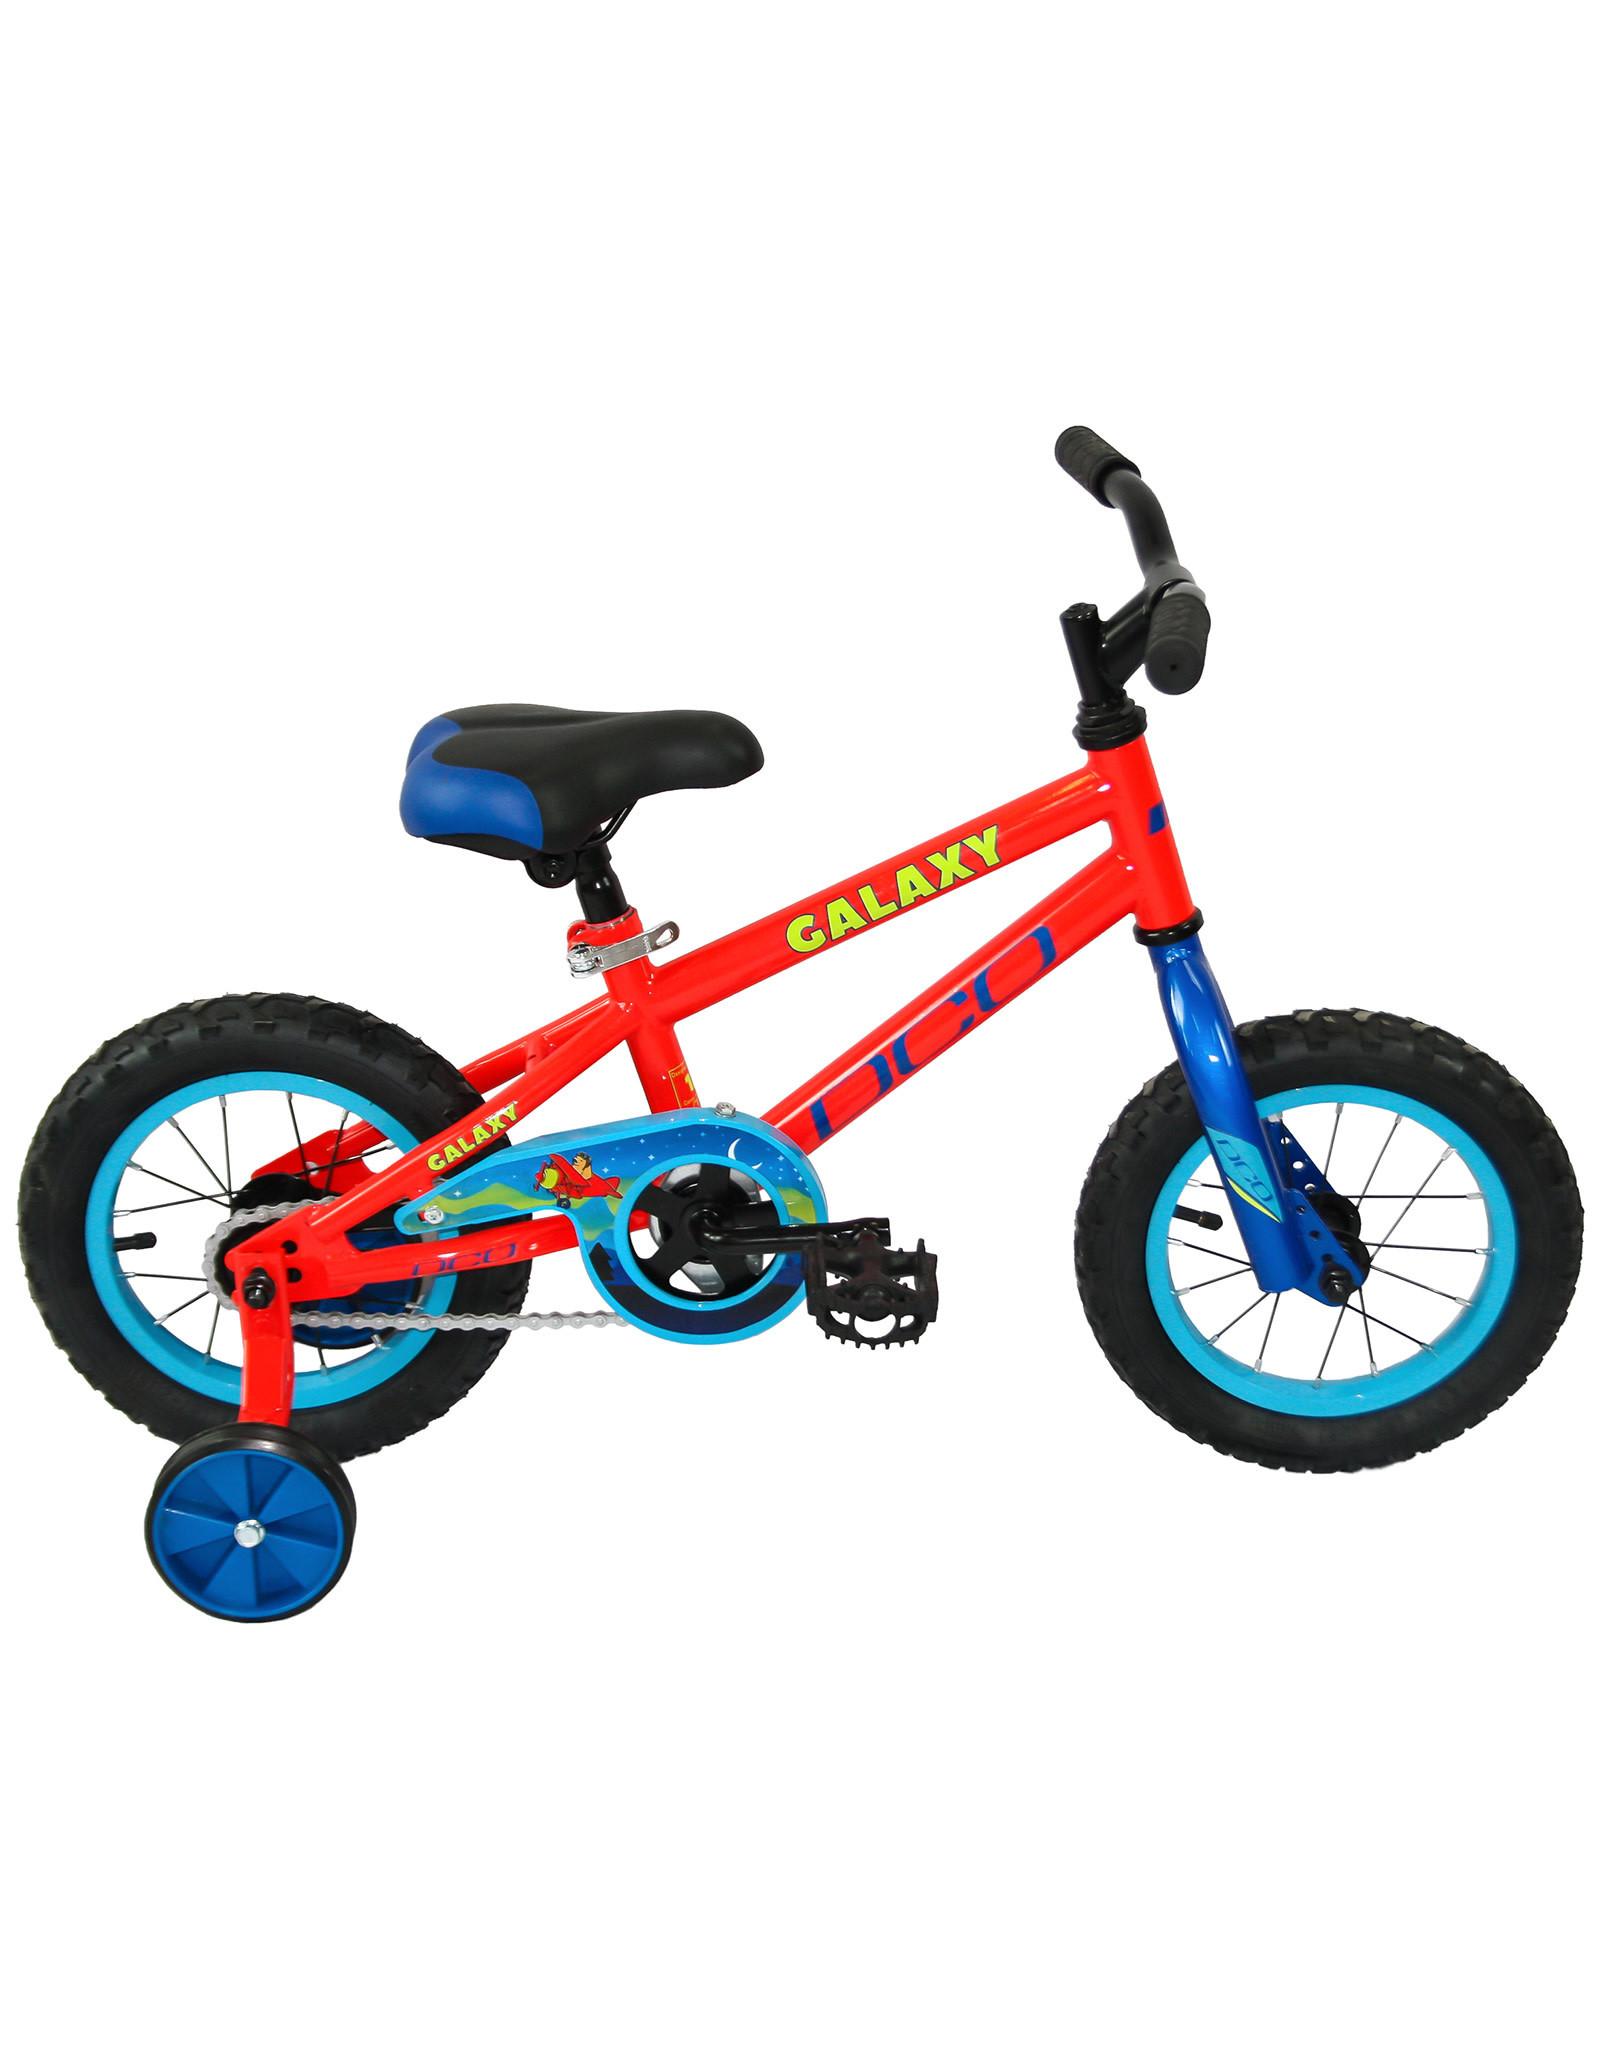 DCO Vélo junior DCO GALAXY 12 Rouge Bleu 12